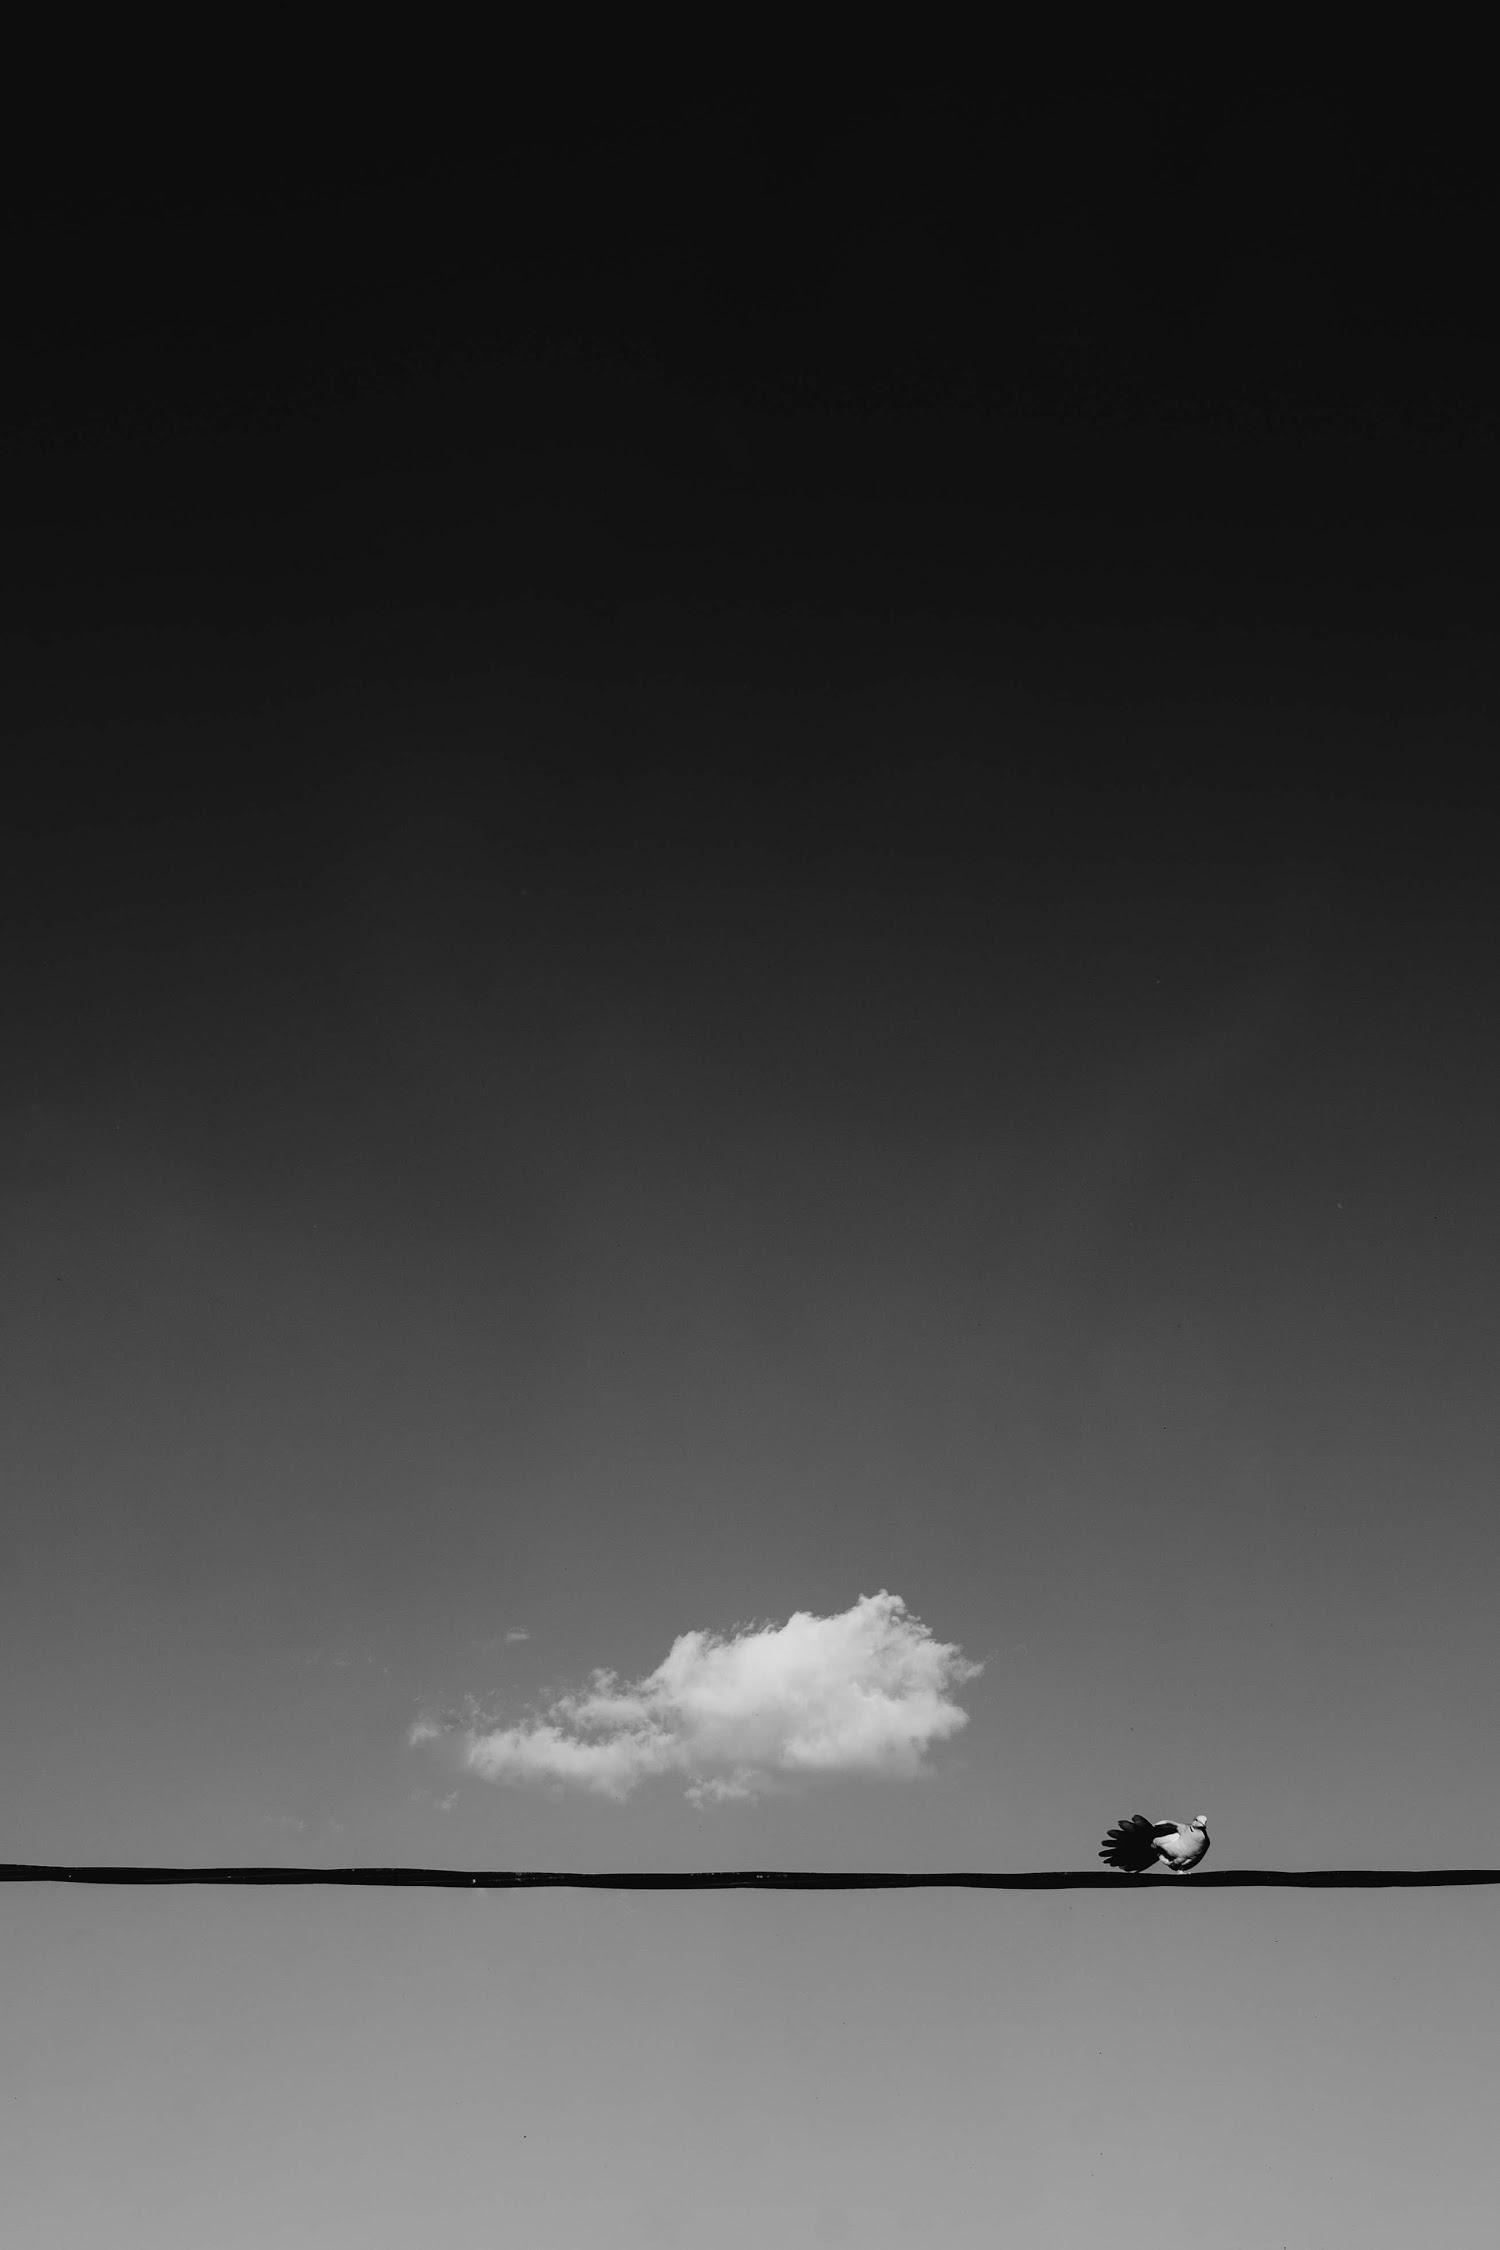 Ảnh background bầu trời xám xịt